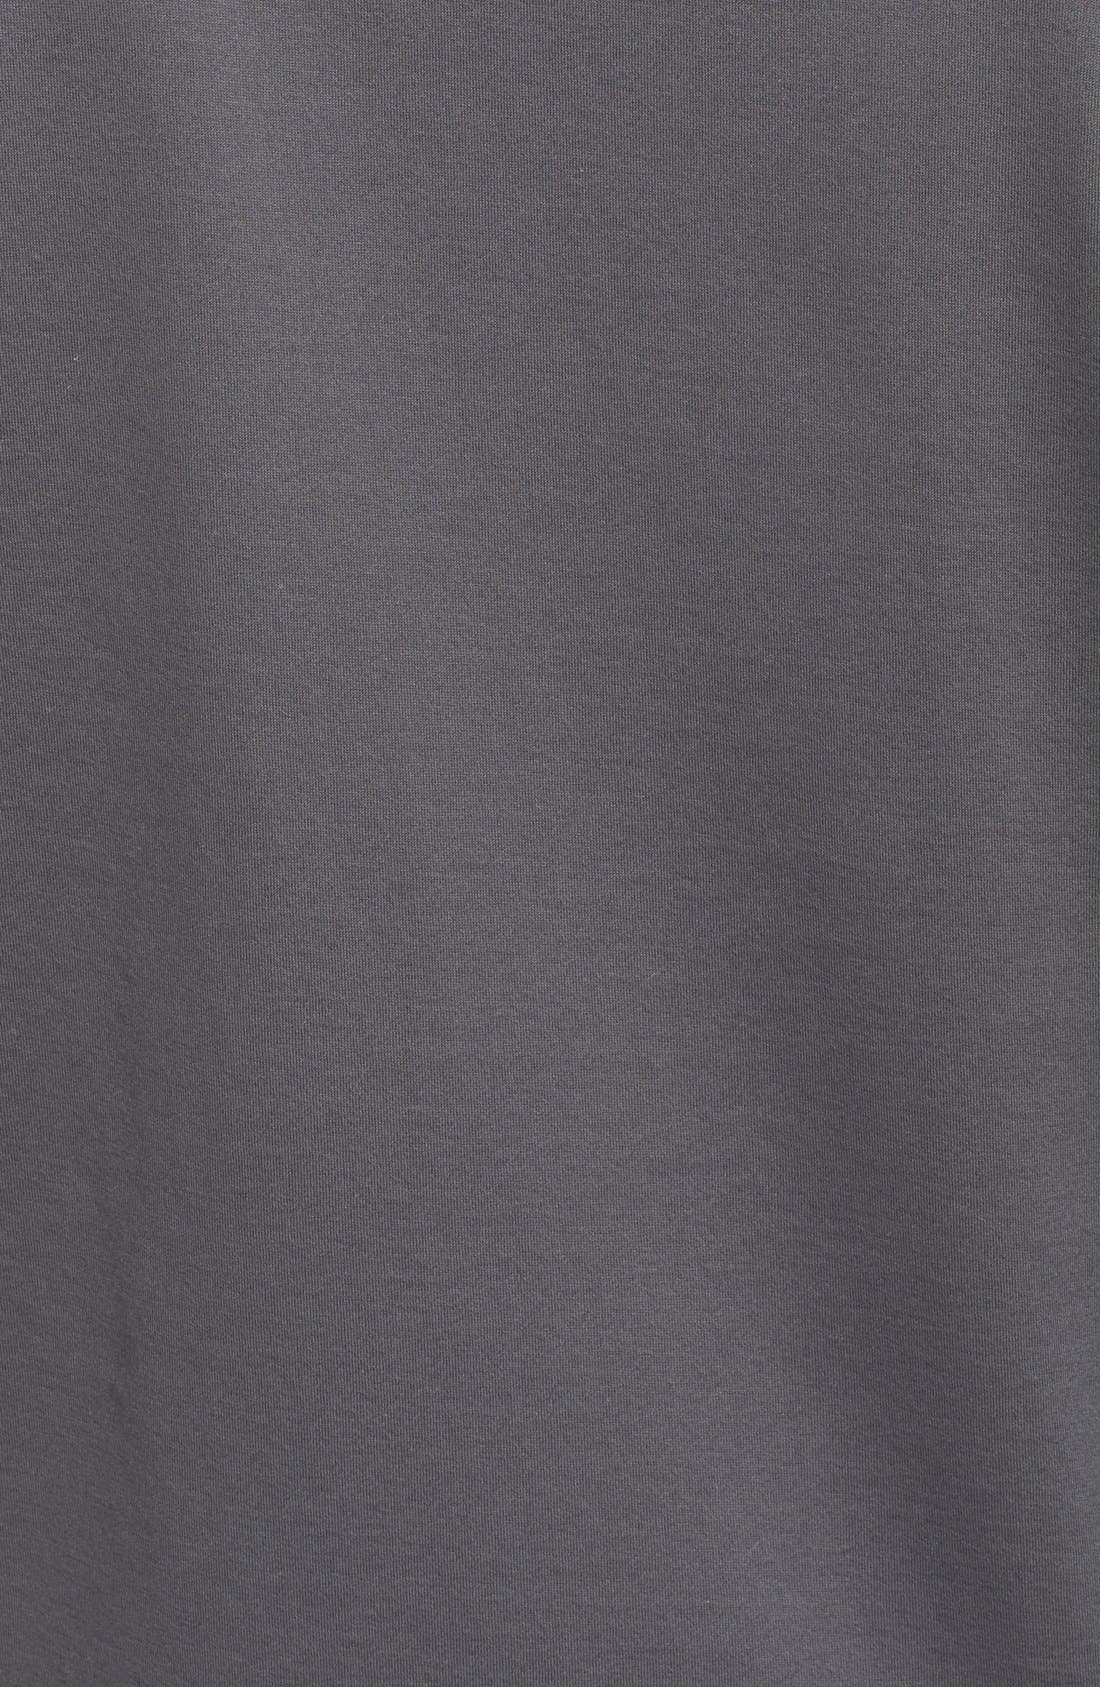 Alternate Image 5  - Z Zegna Flocked Graphic T-Shirt